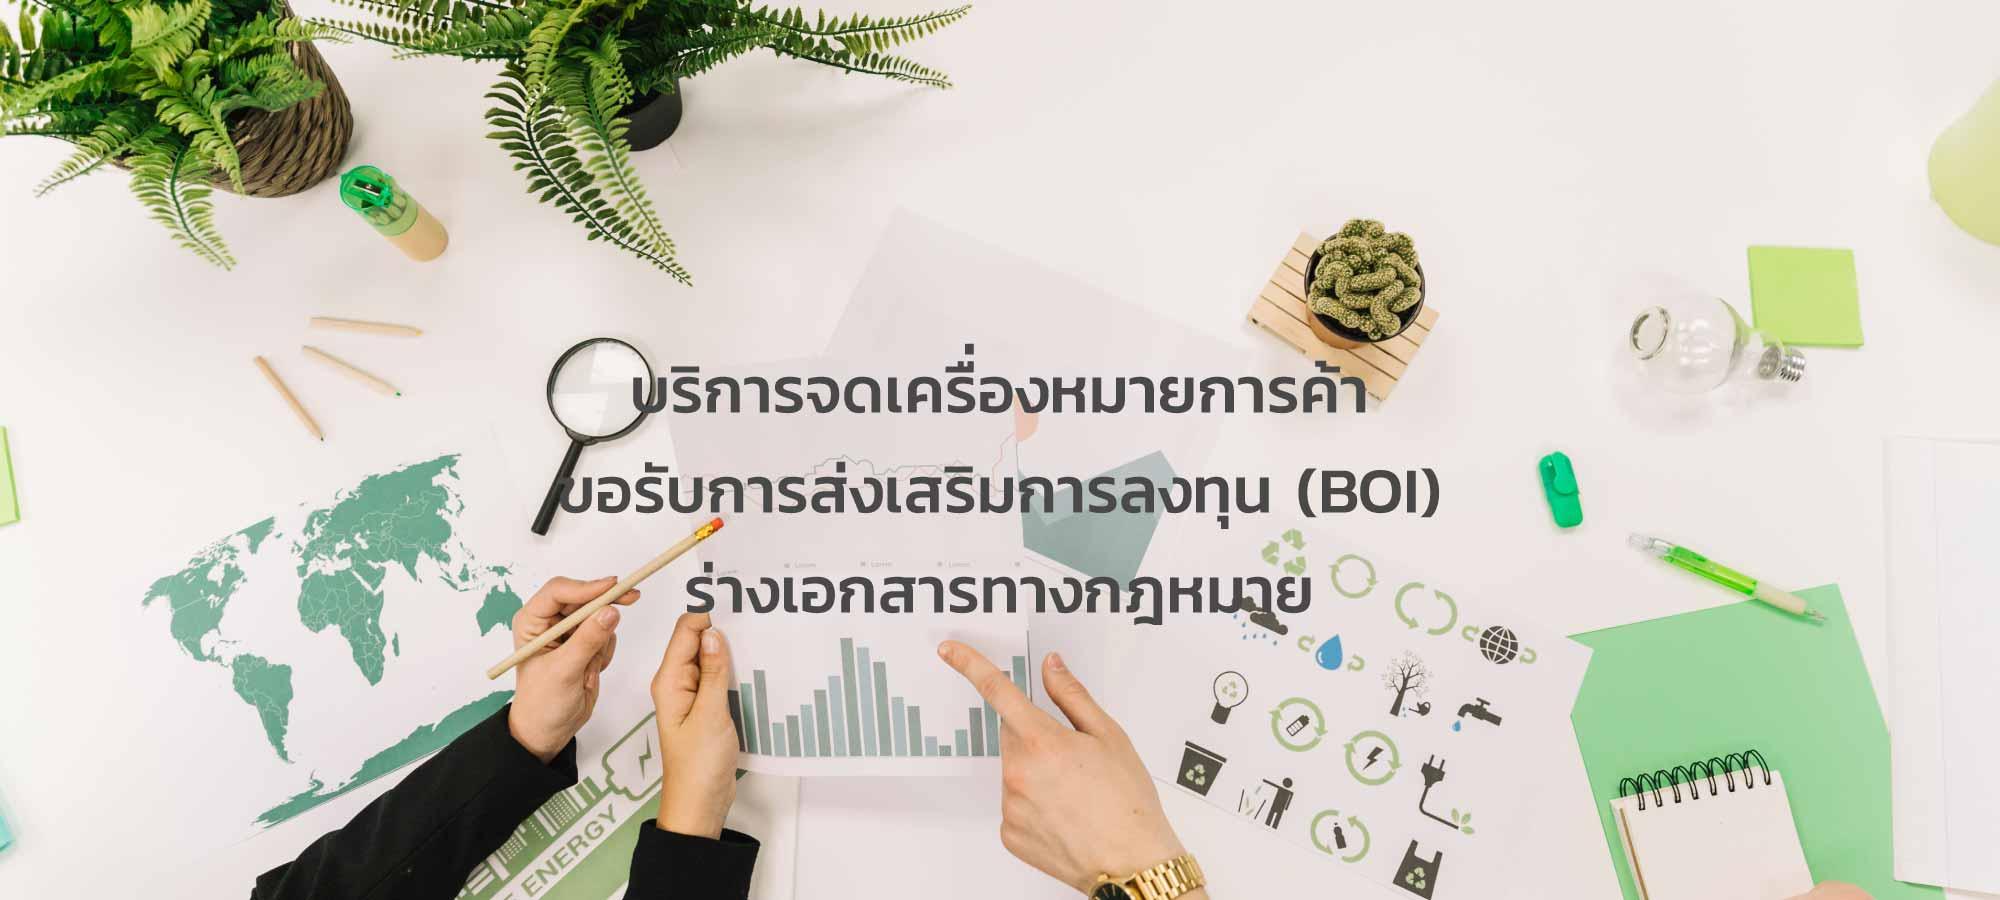 trademark-boi-banner